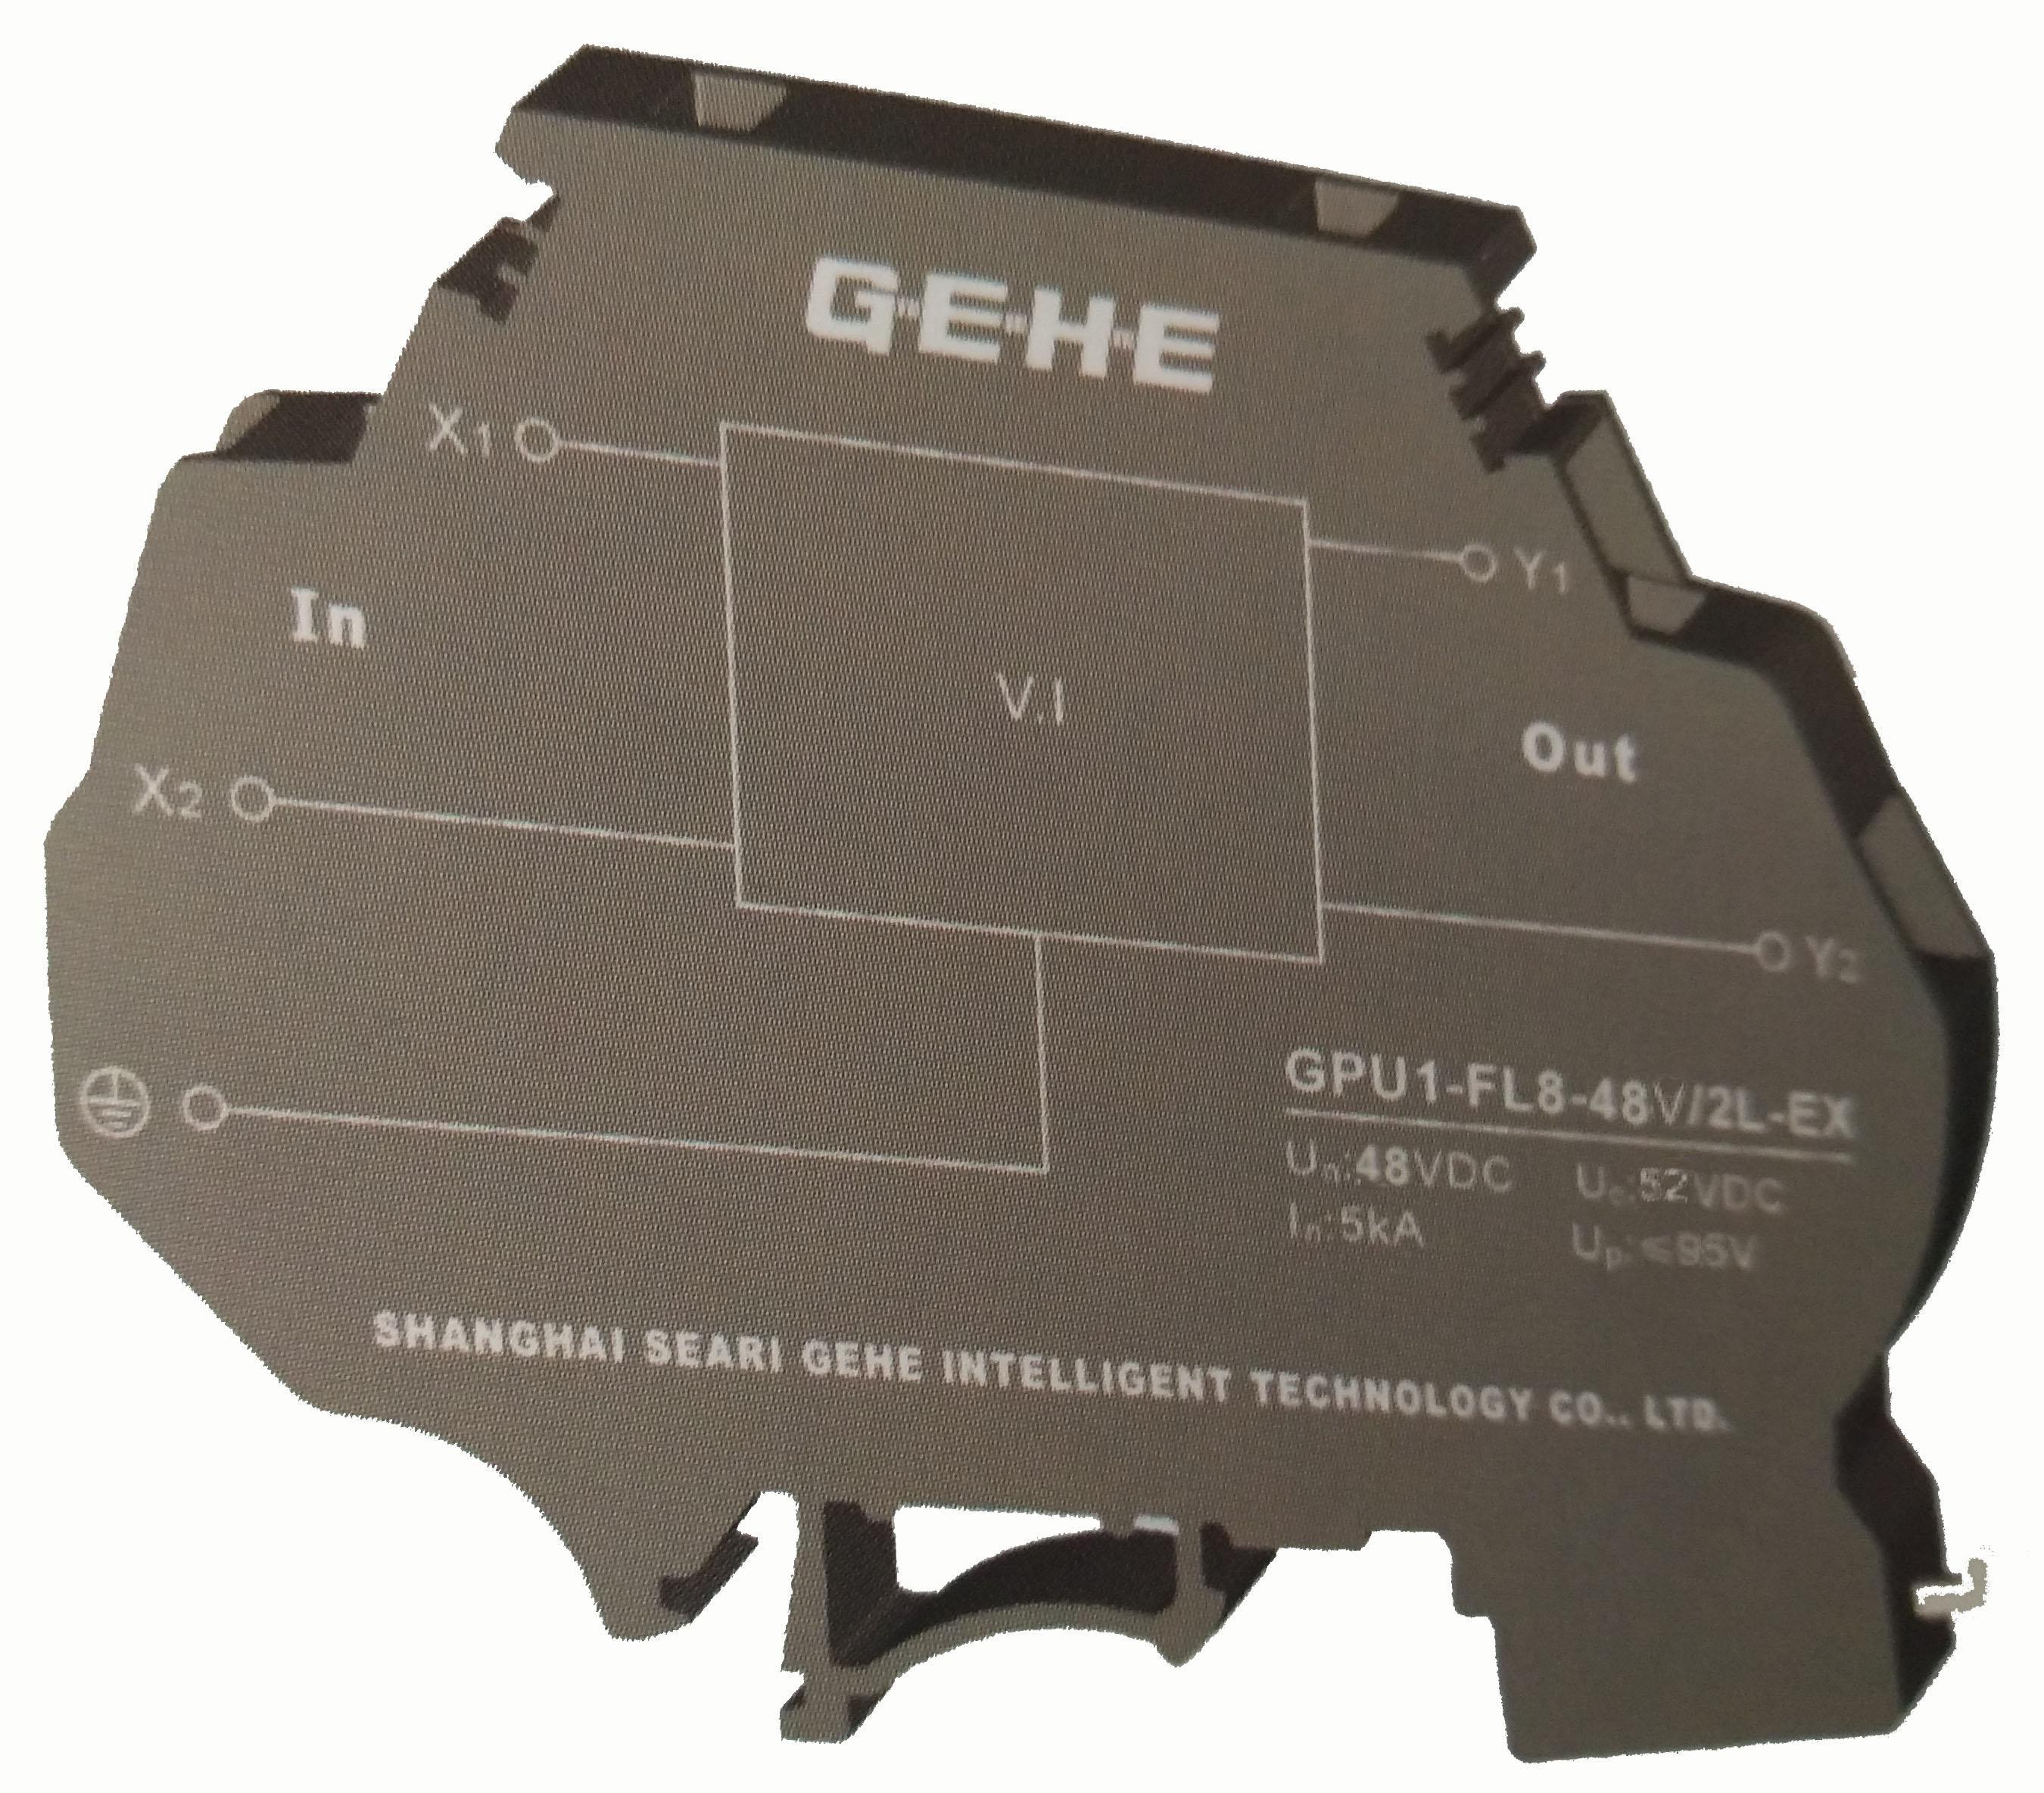 48V GPU1-FL8/2L-EX系列信号max万博网址是多少保护器